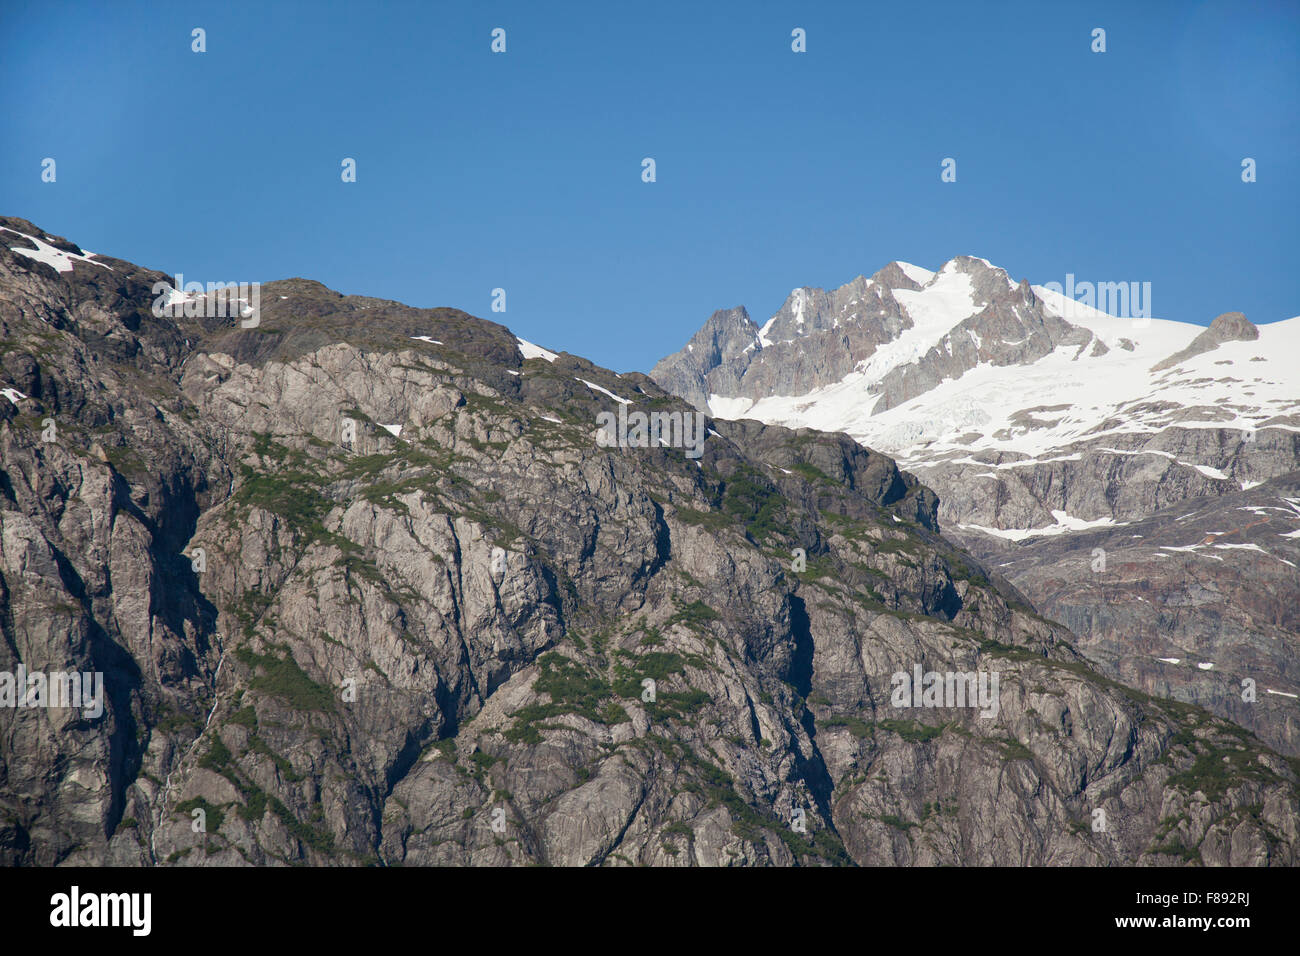 mountain peaks and rugged terrain in alaska - Stock Image